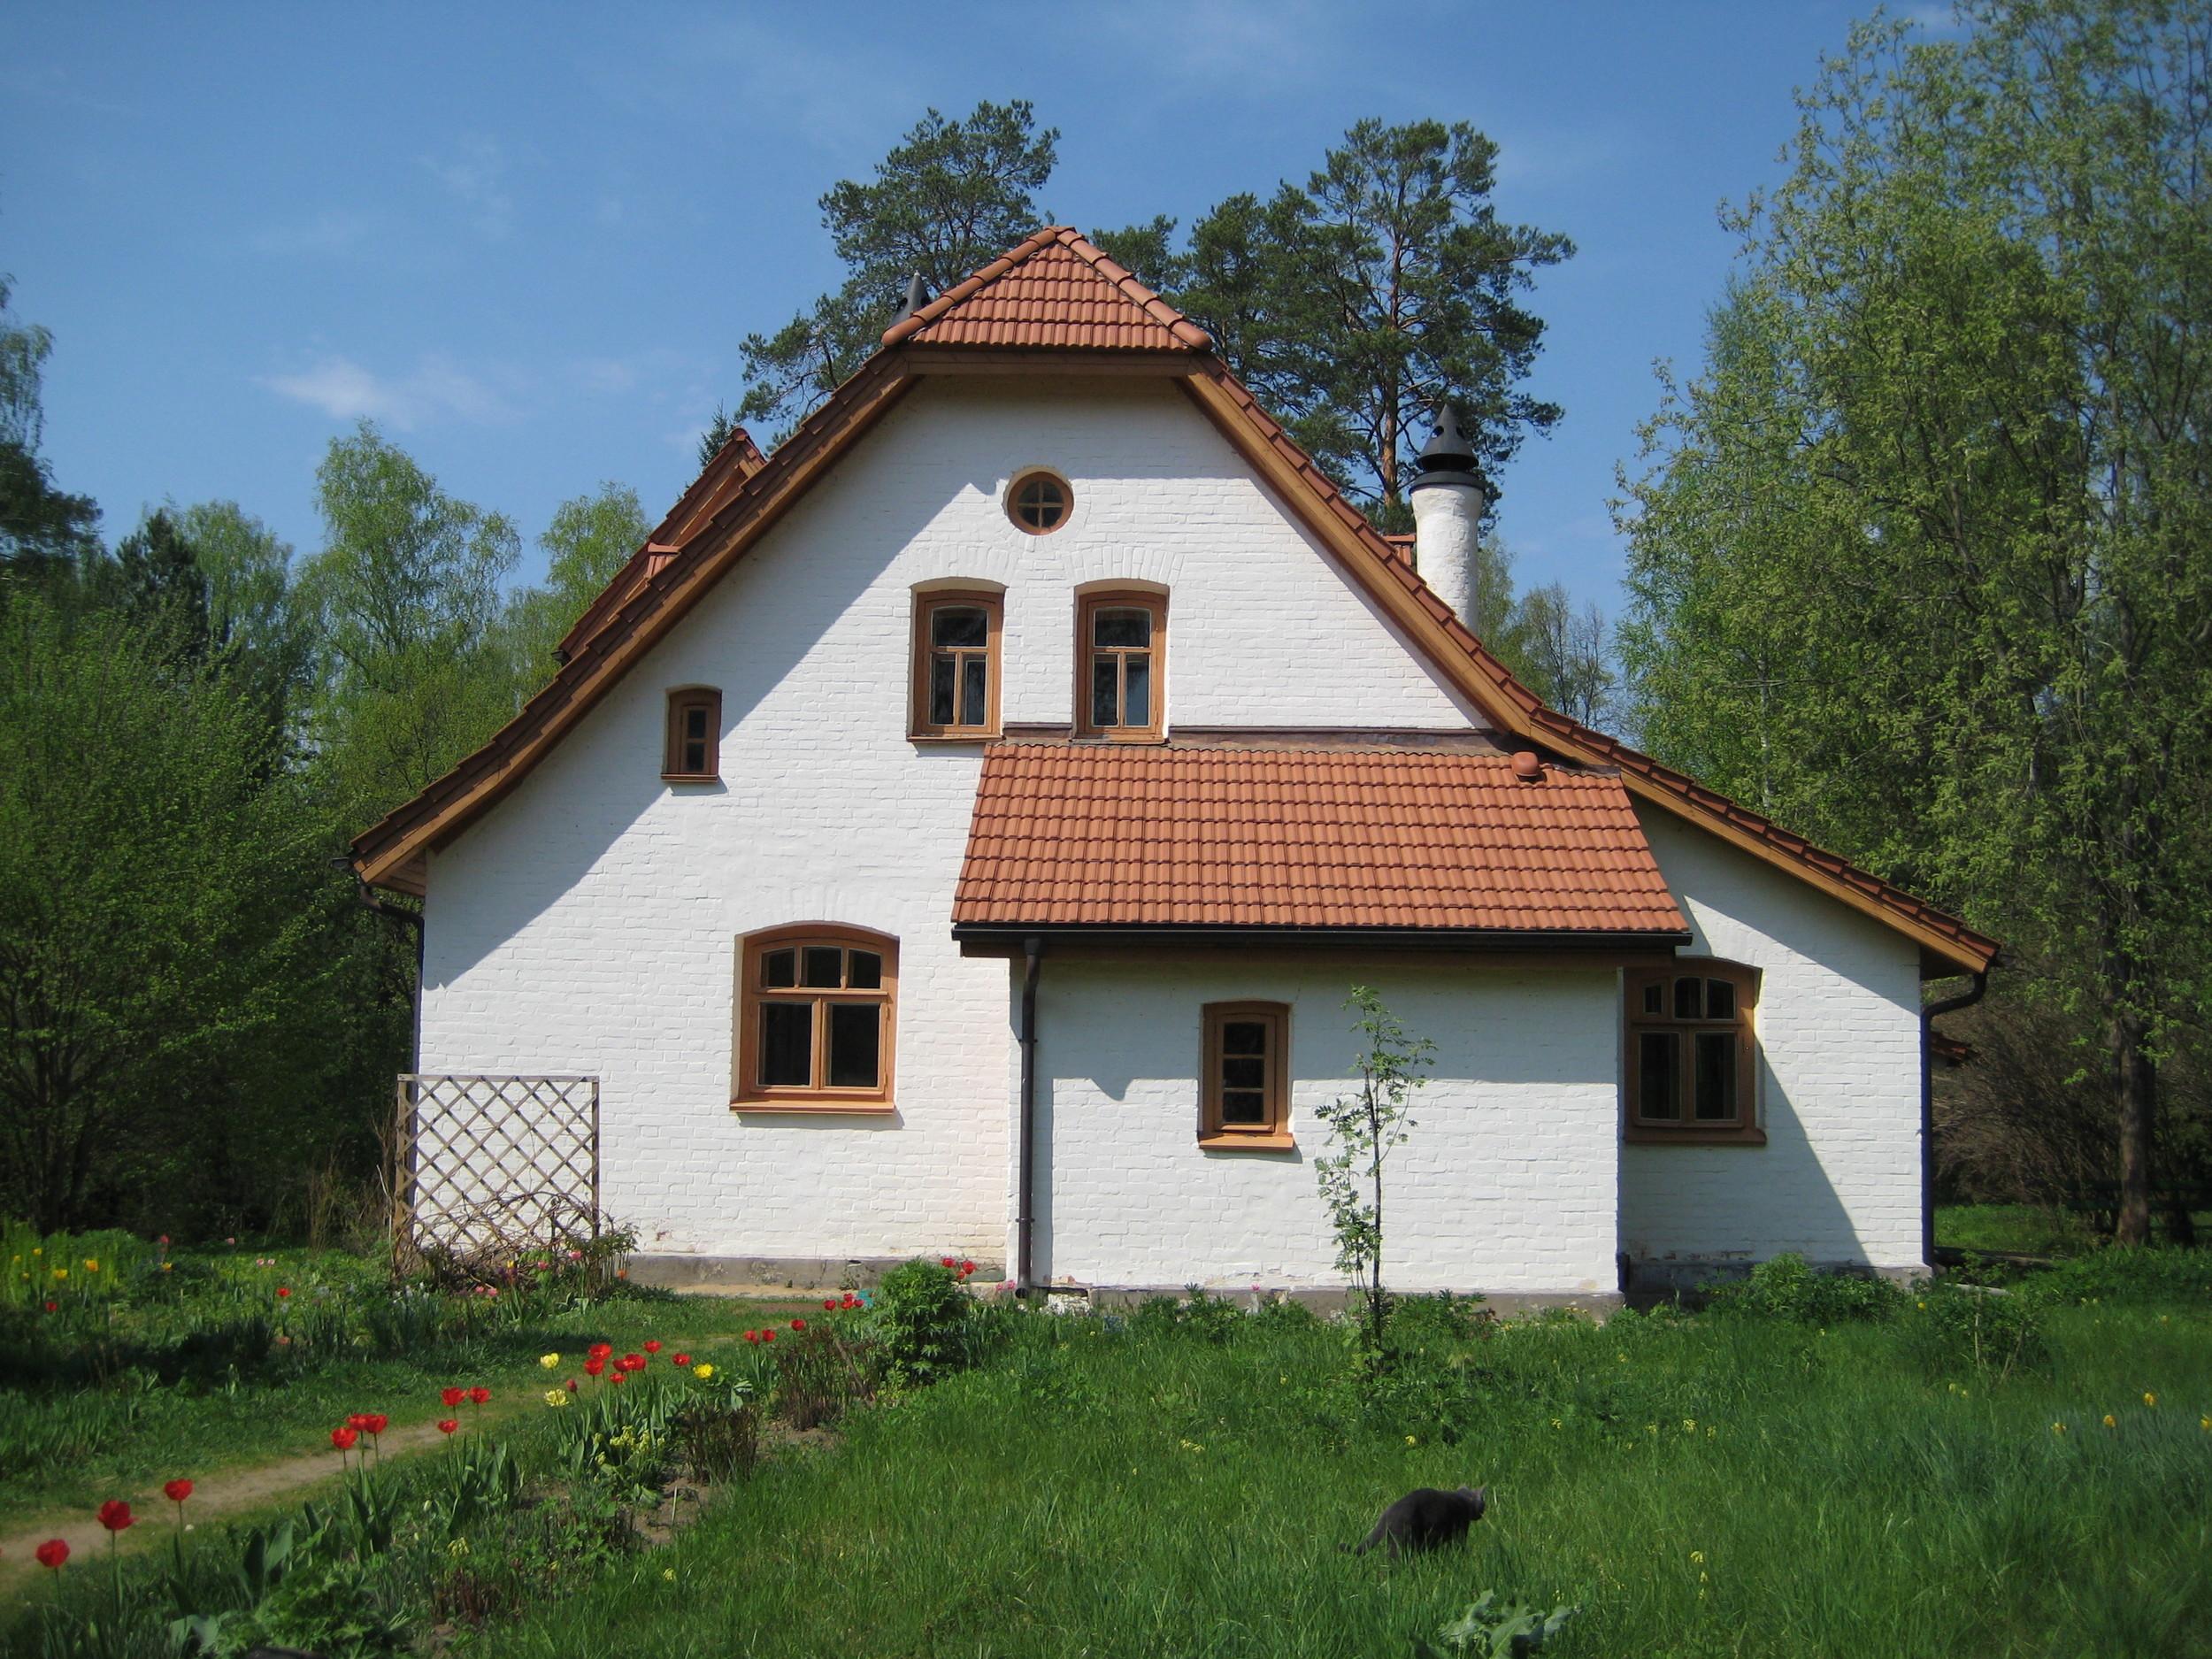 landmark-of-the-week-polenovs-abbey-studio-at-polenovo